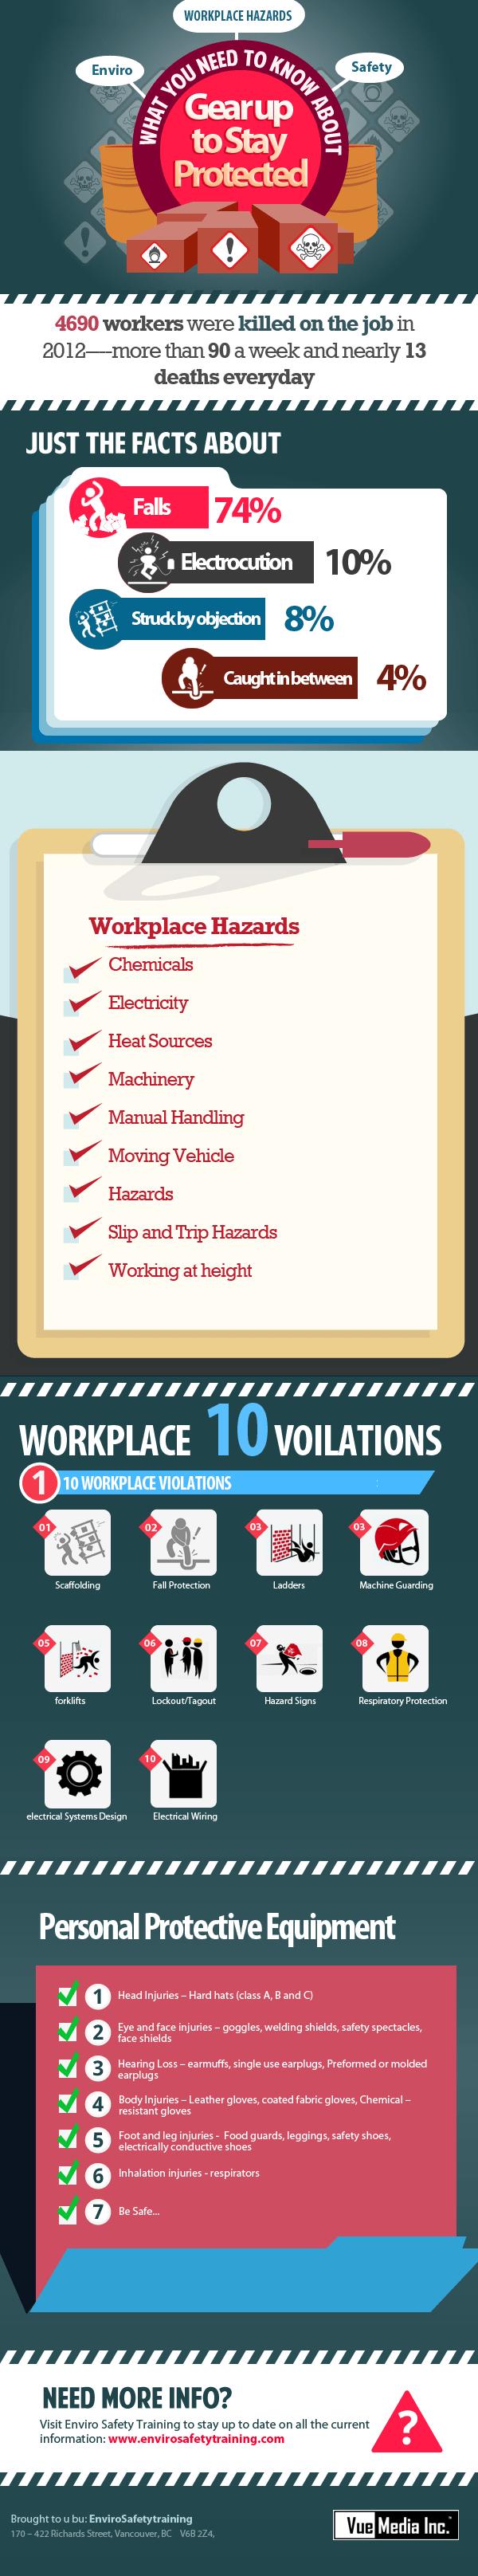 work-place-hazards_5183a182f0b1e